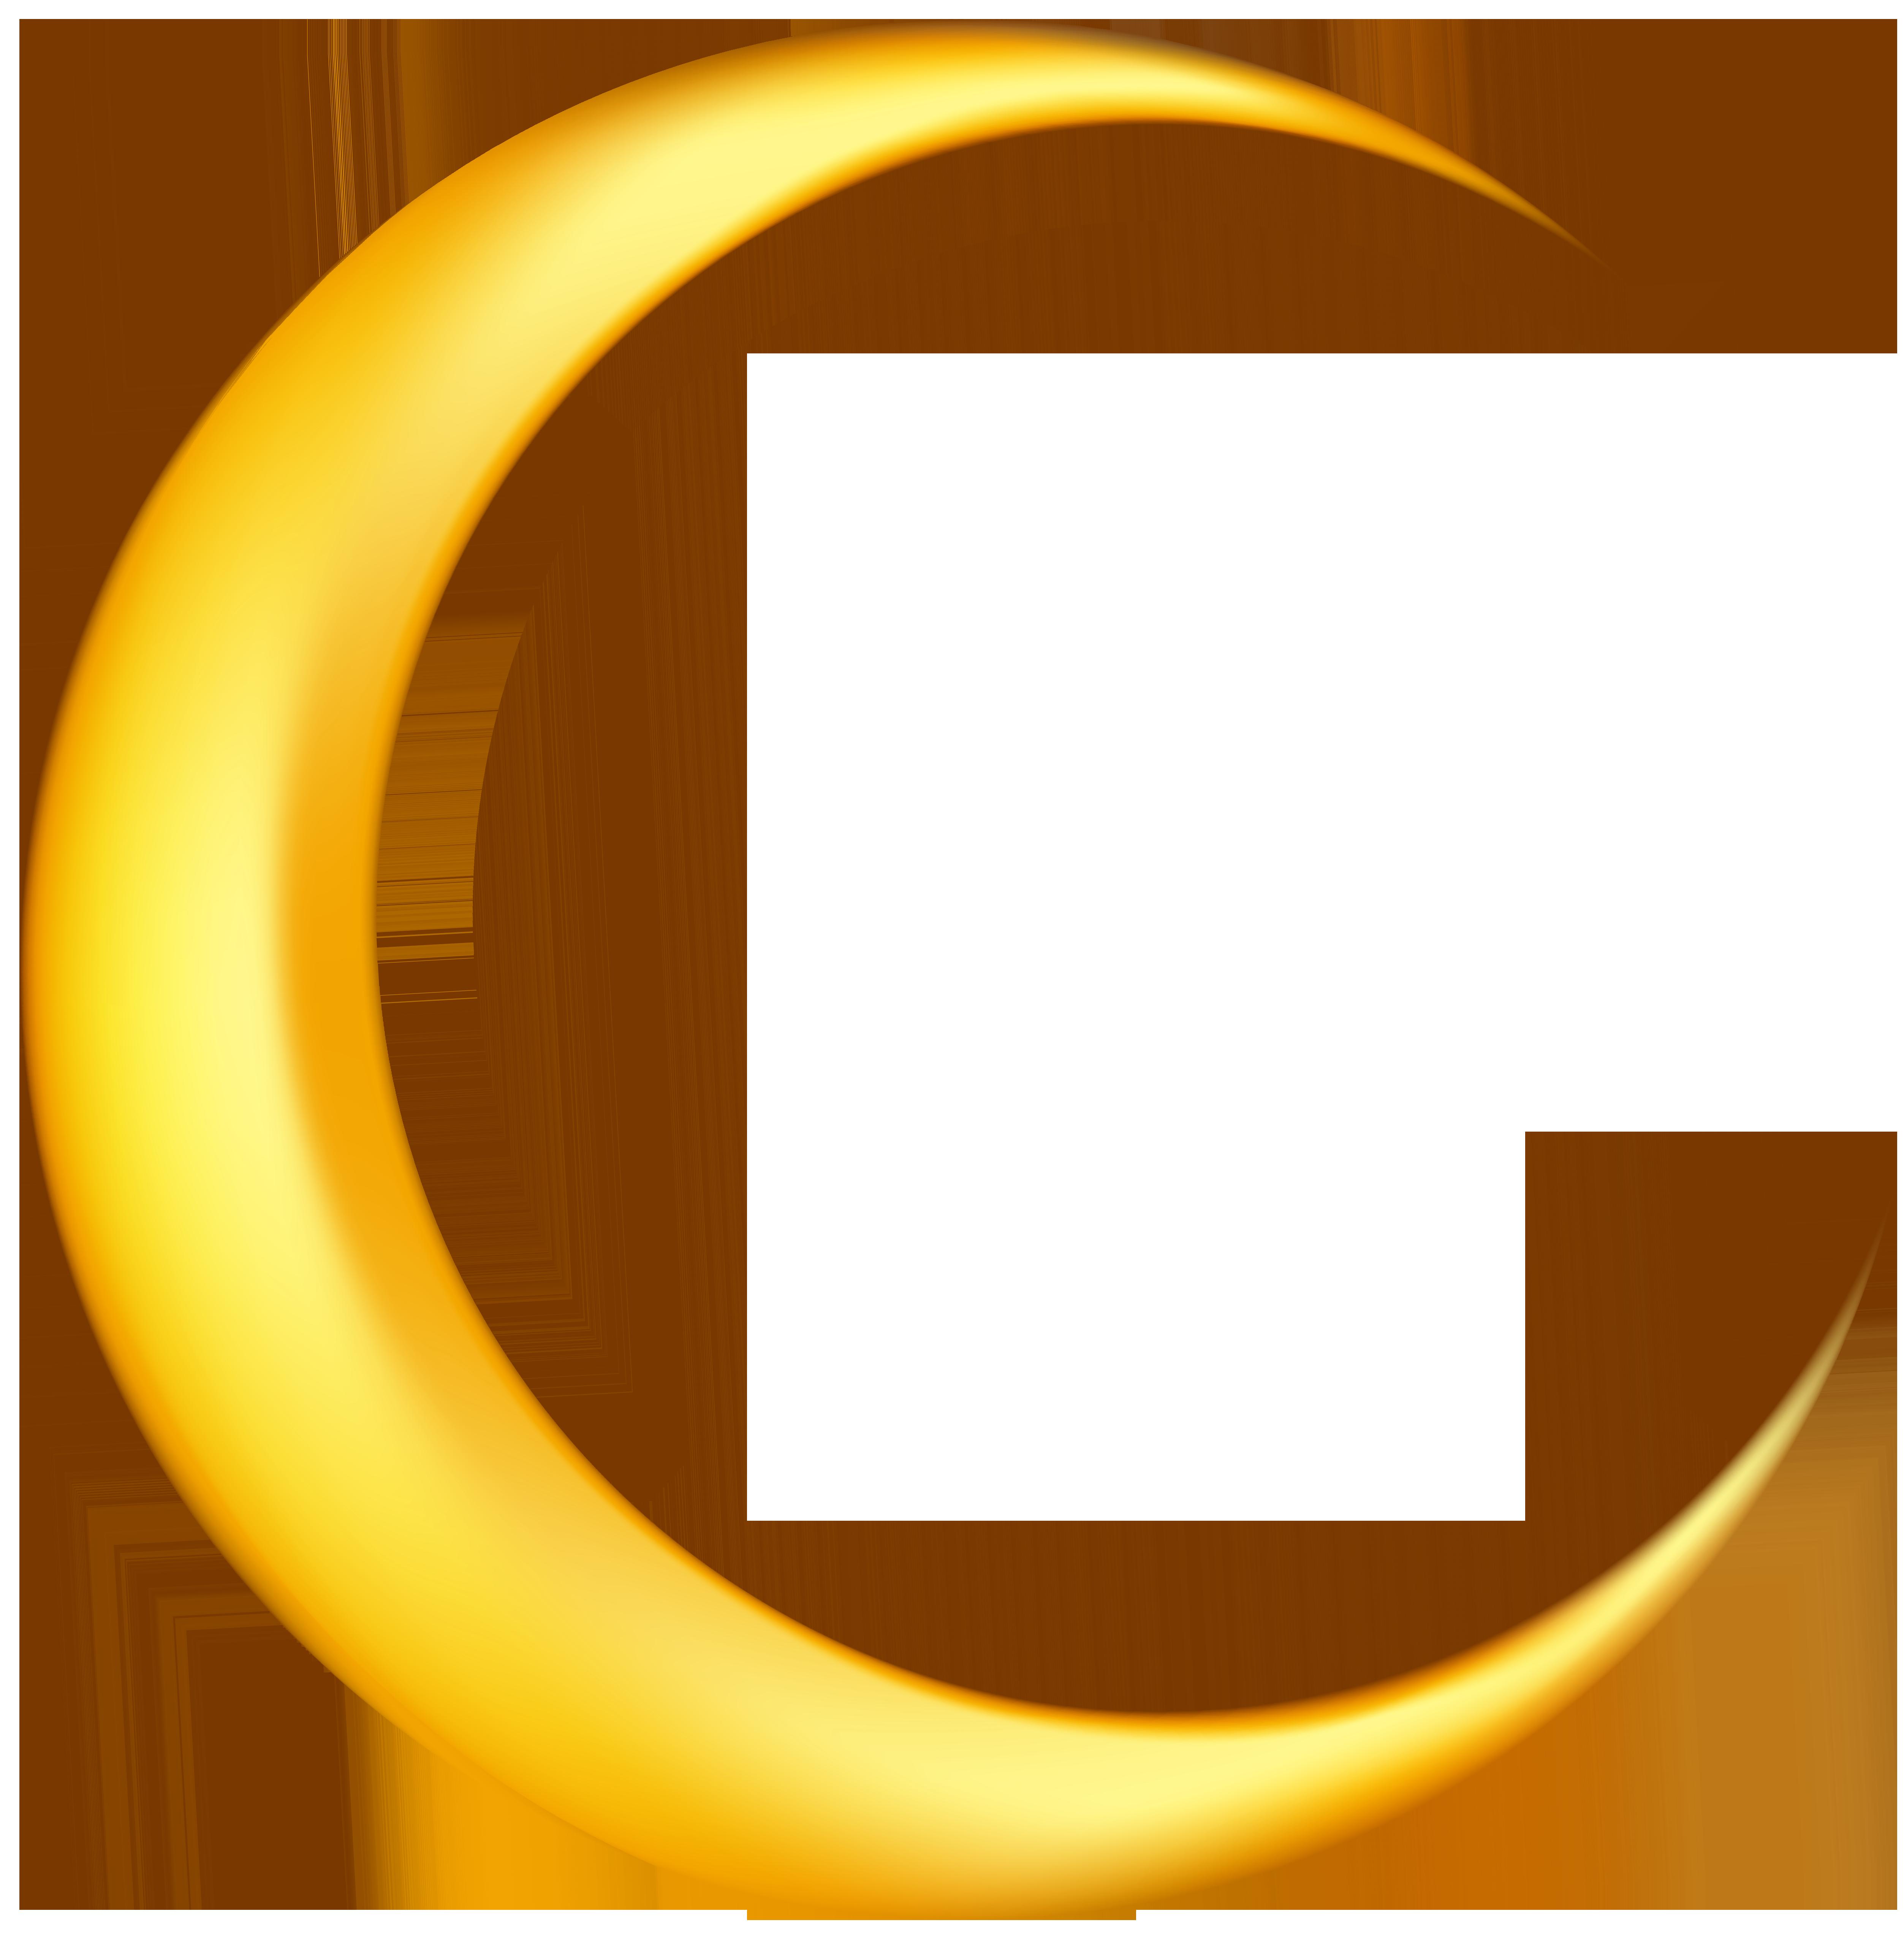 Moon Clipart Moon Clipart-Moon Clipart Moon Clipart-7